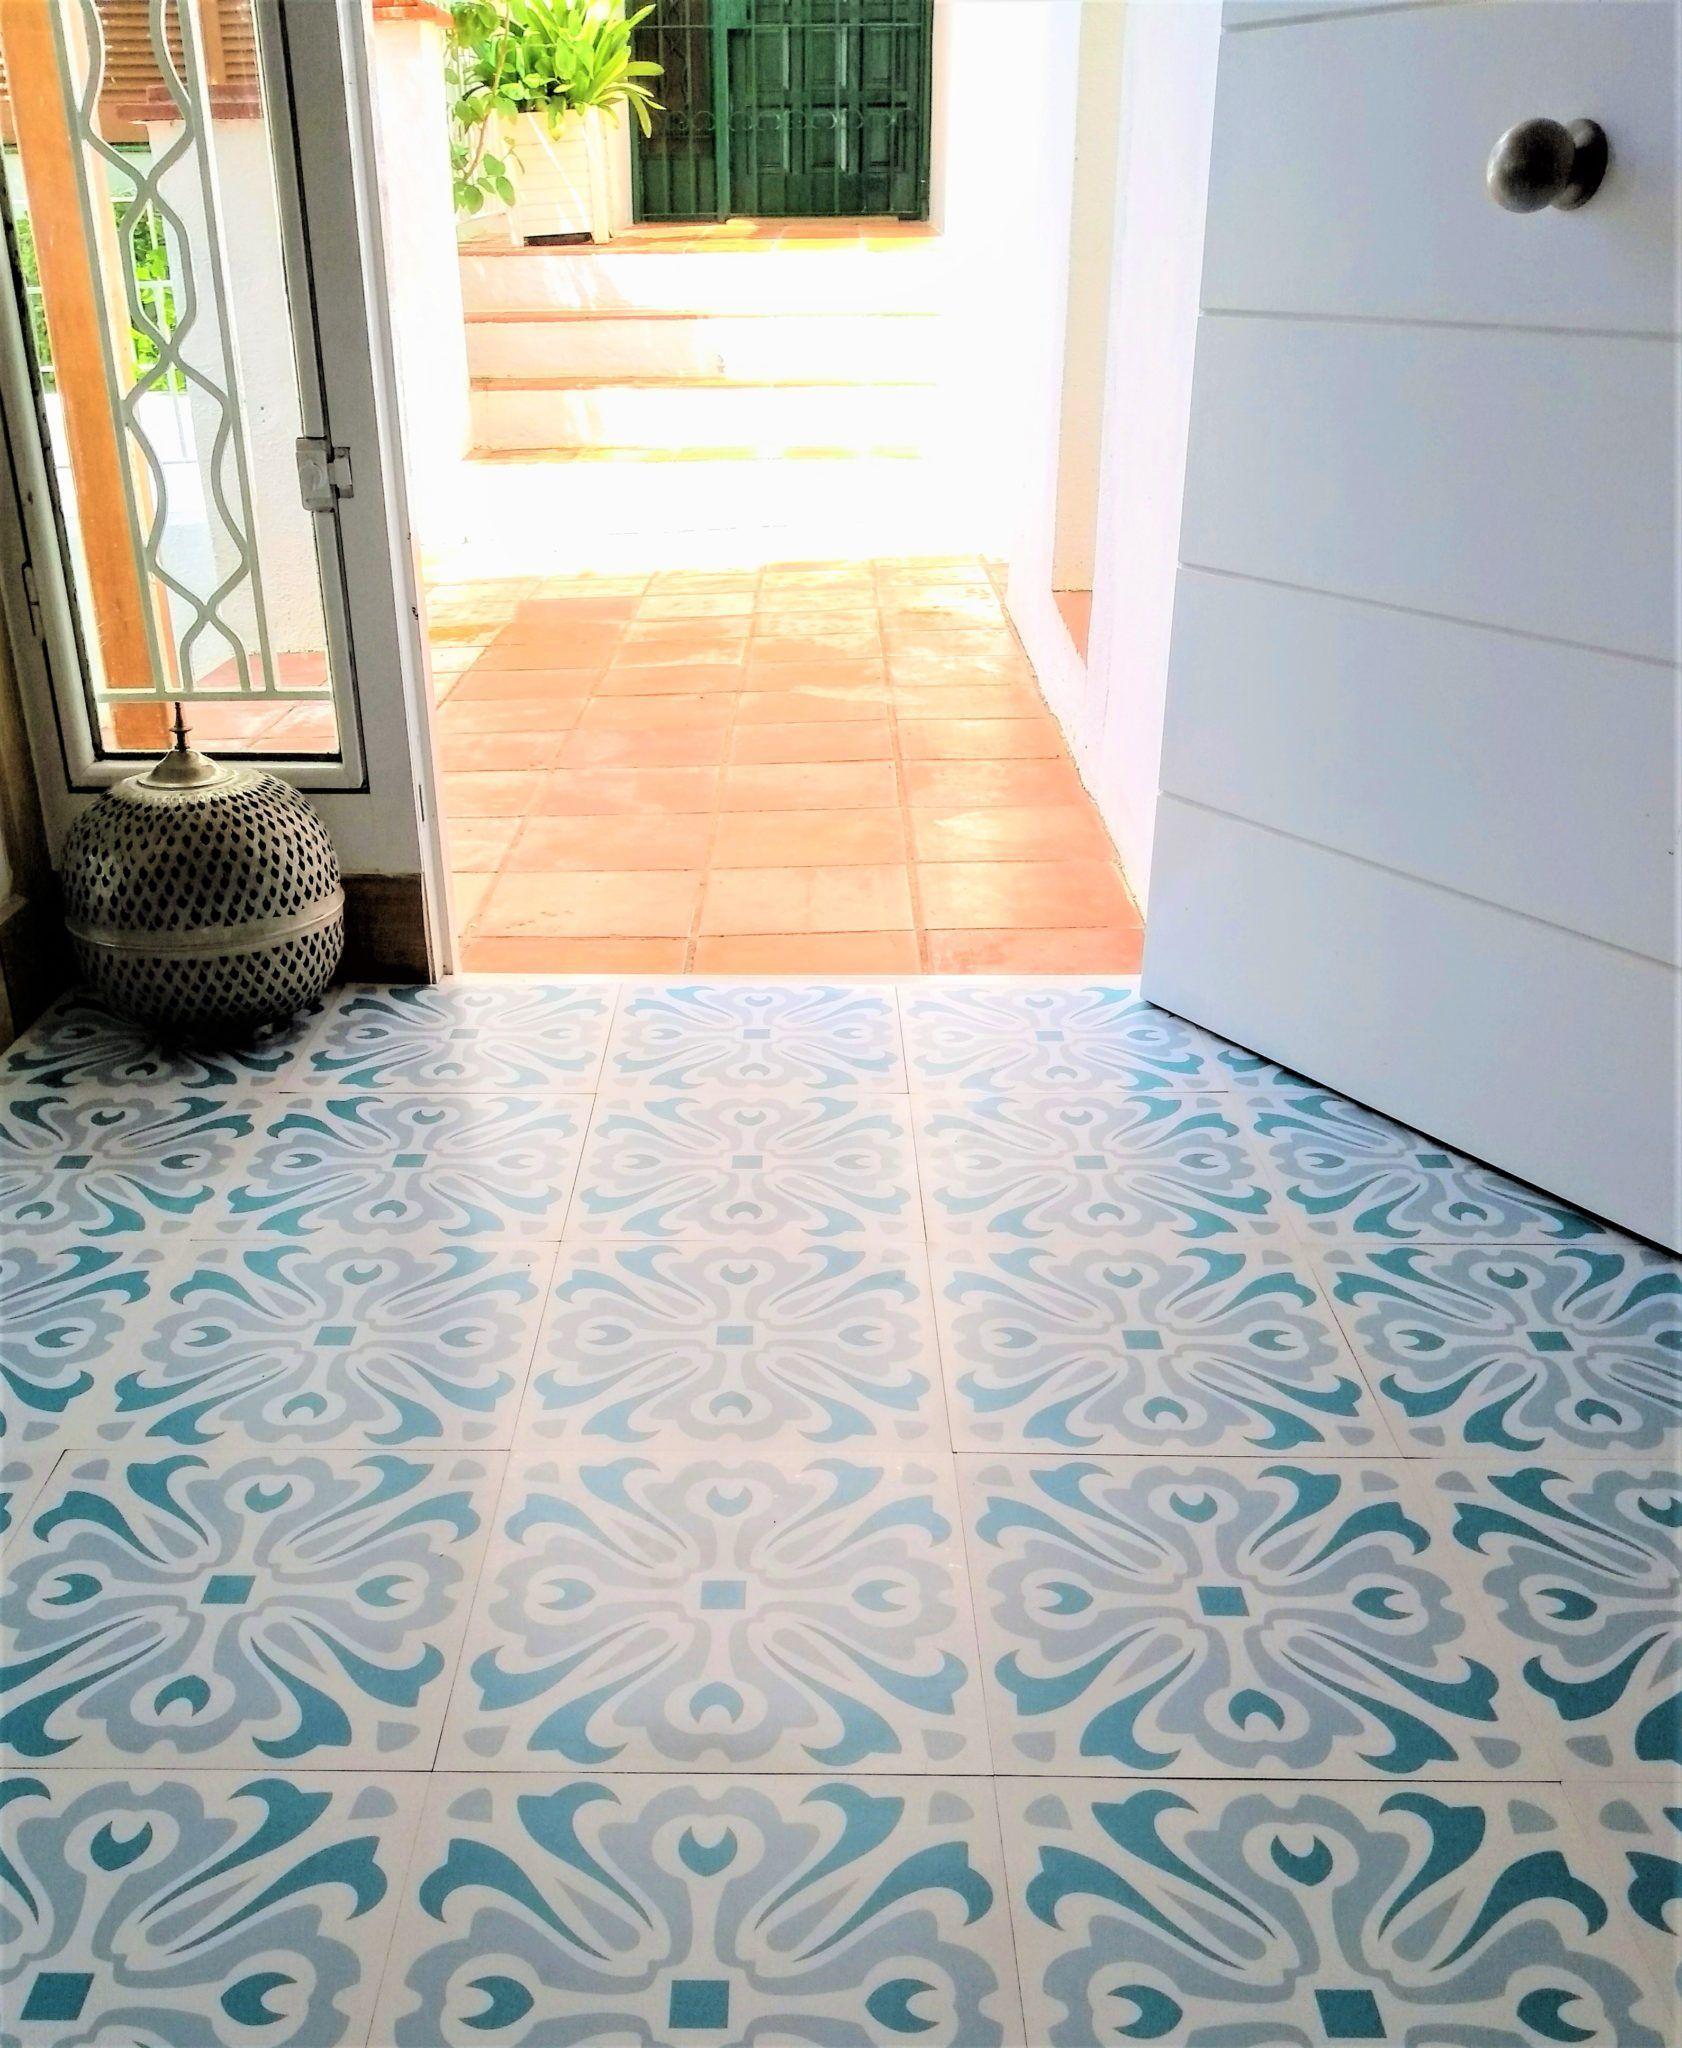 Havana Day Vinyl Floor Tile 18 Per M2 Vinyl Tile Flooring Bathroom Vinyl Flooring Kitchen Vinyl Flooring Uk